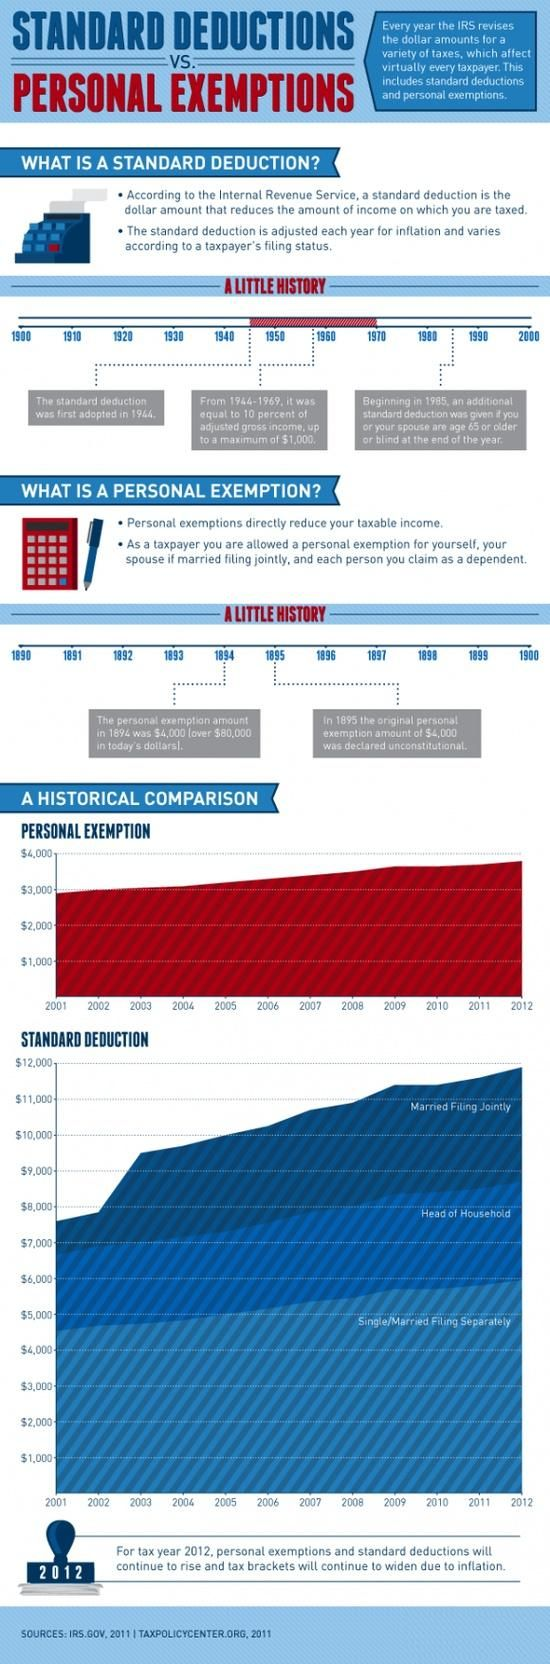 Standard Deductions vs Personal Exemptions